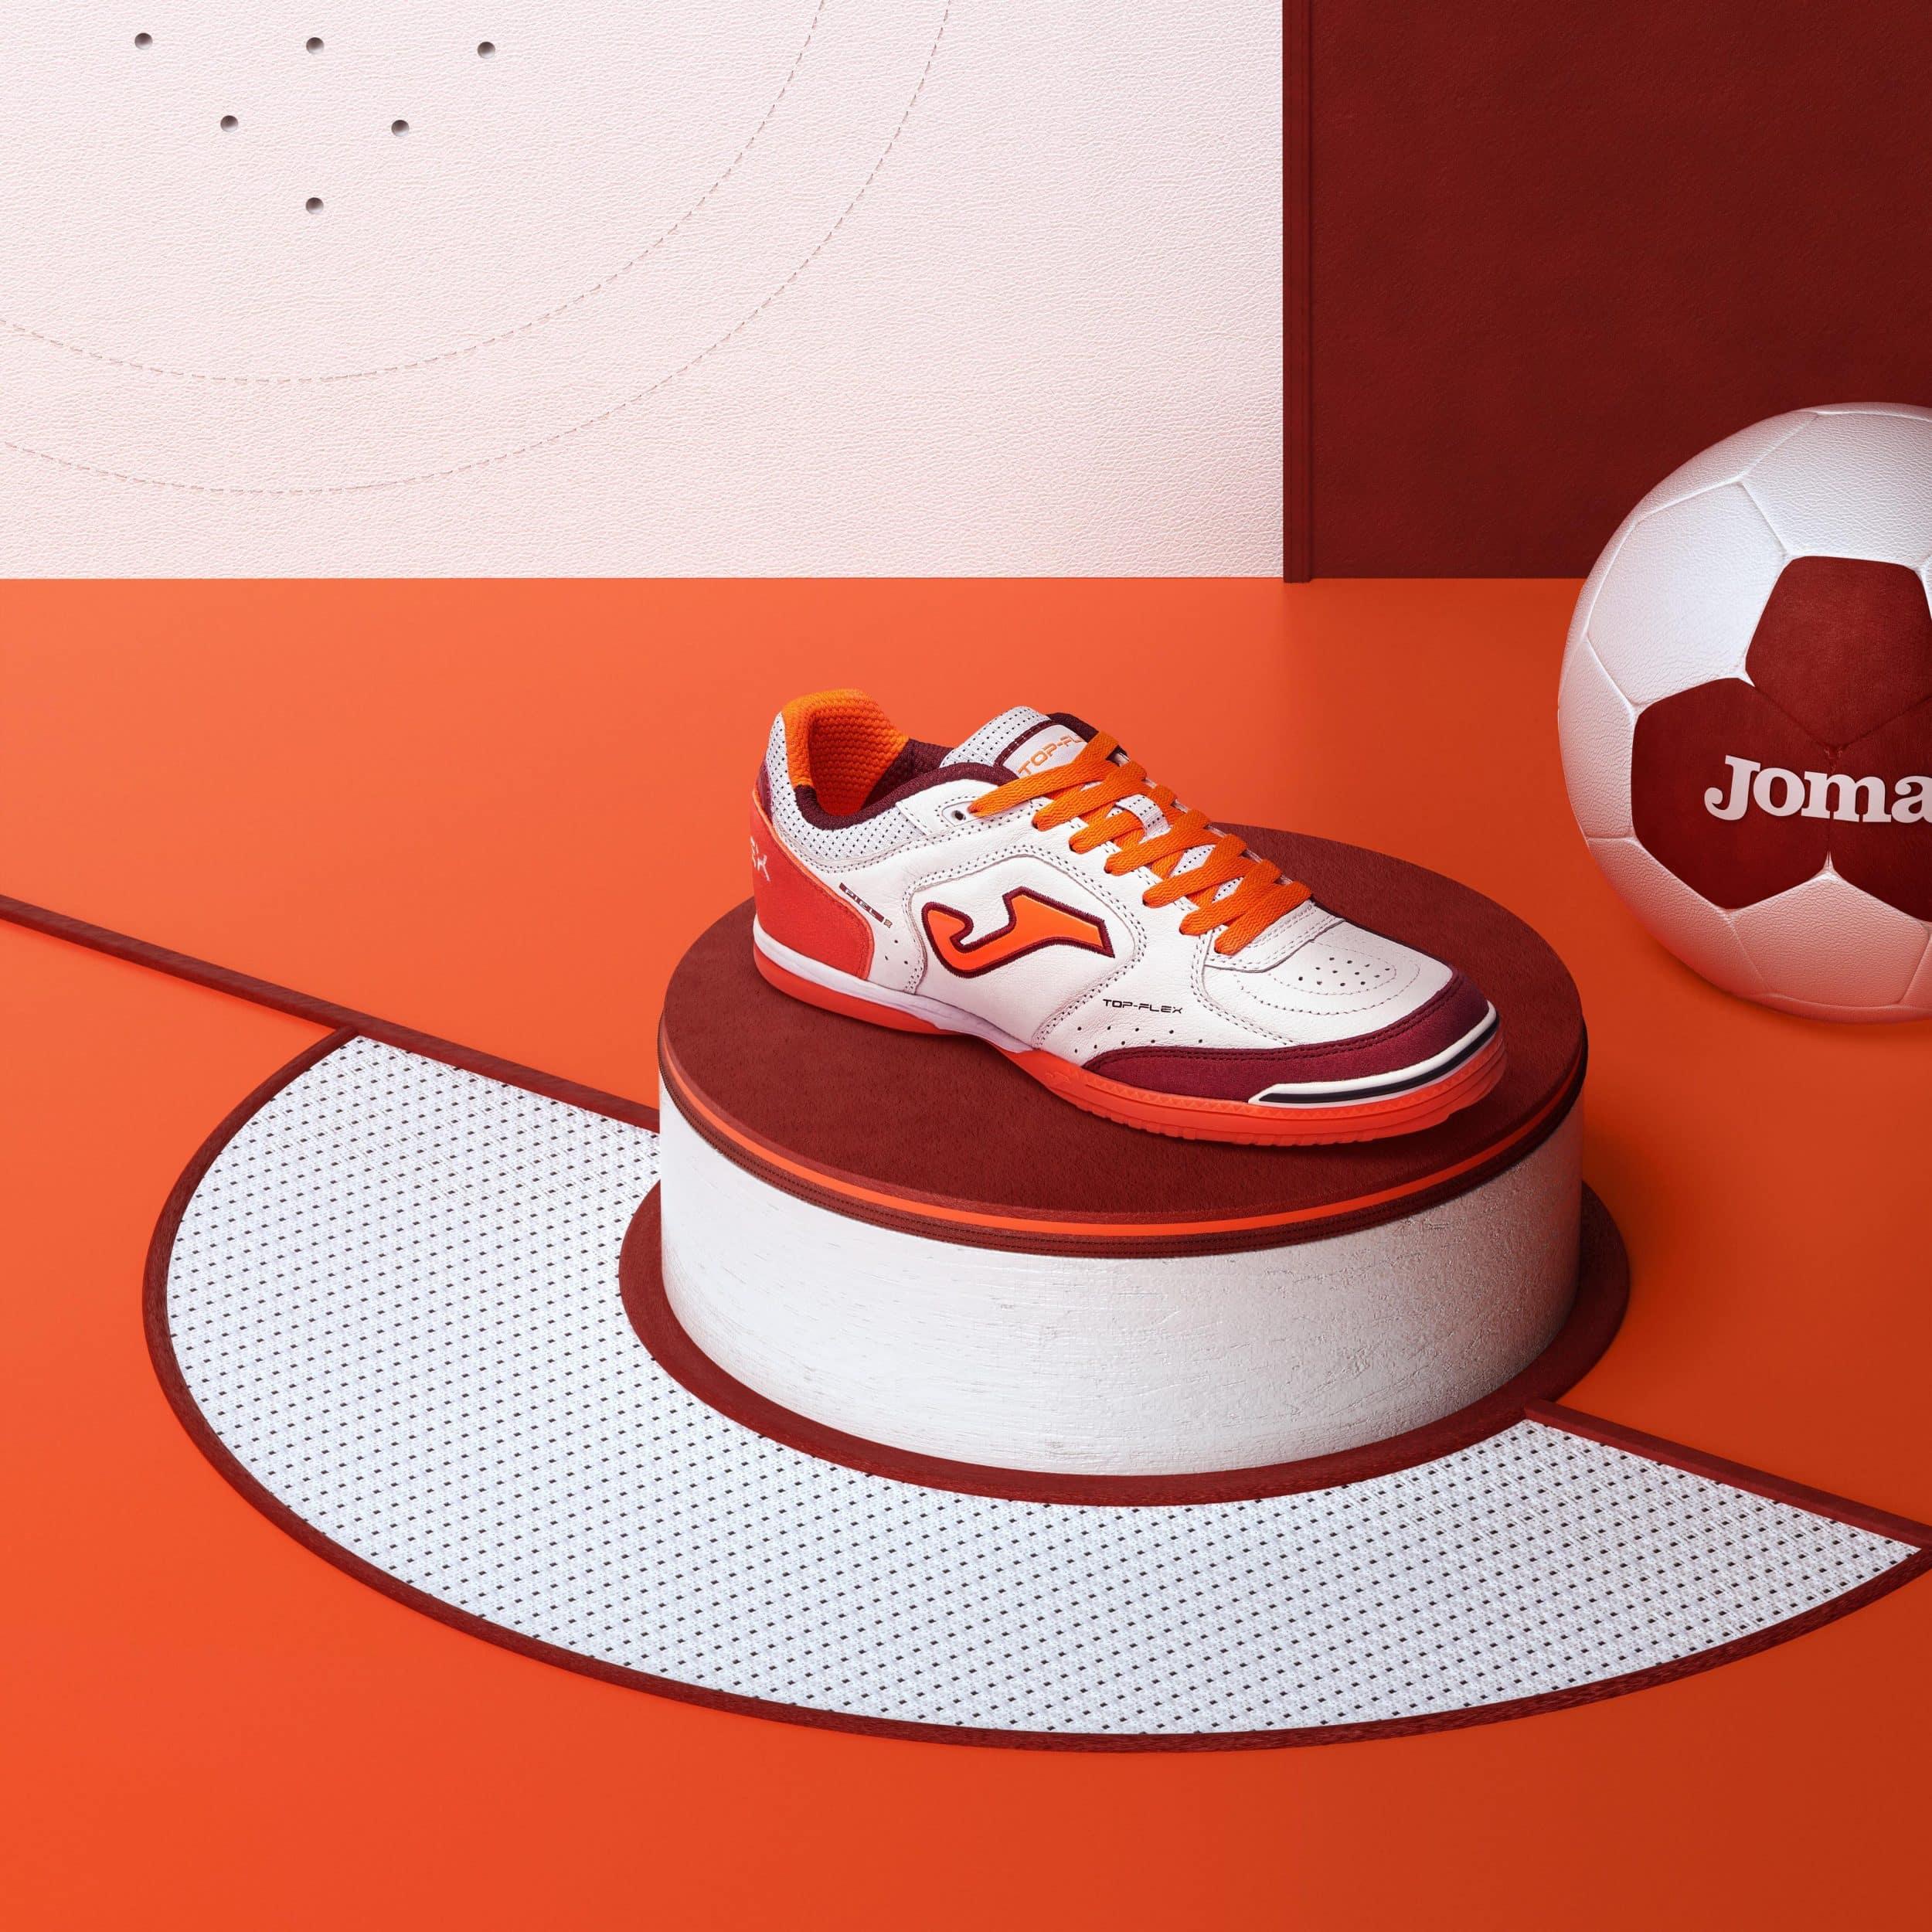 joma-top-flex-futsal